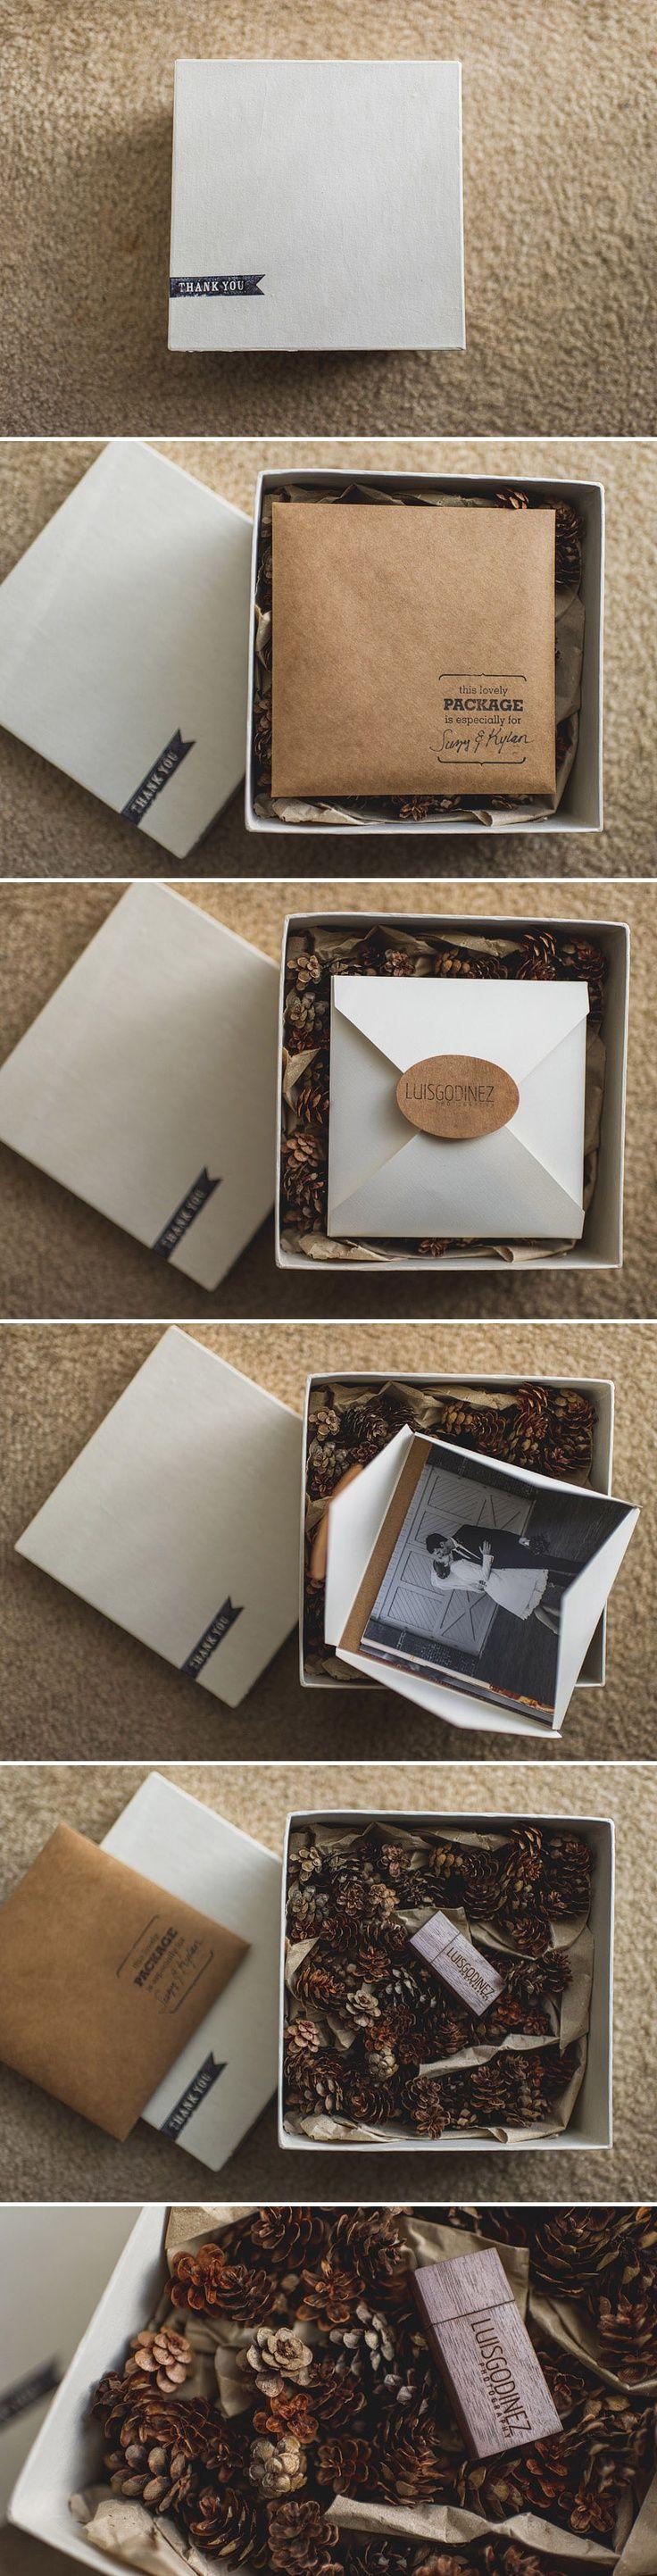 213fd14f68faf70cd02b99e5ec57f2fb Pretty Little Packaging :: Presentation Ideas for Photographers :: Laura Winslow Photography